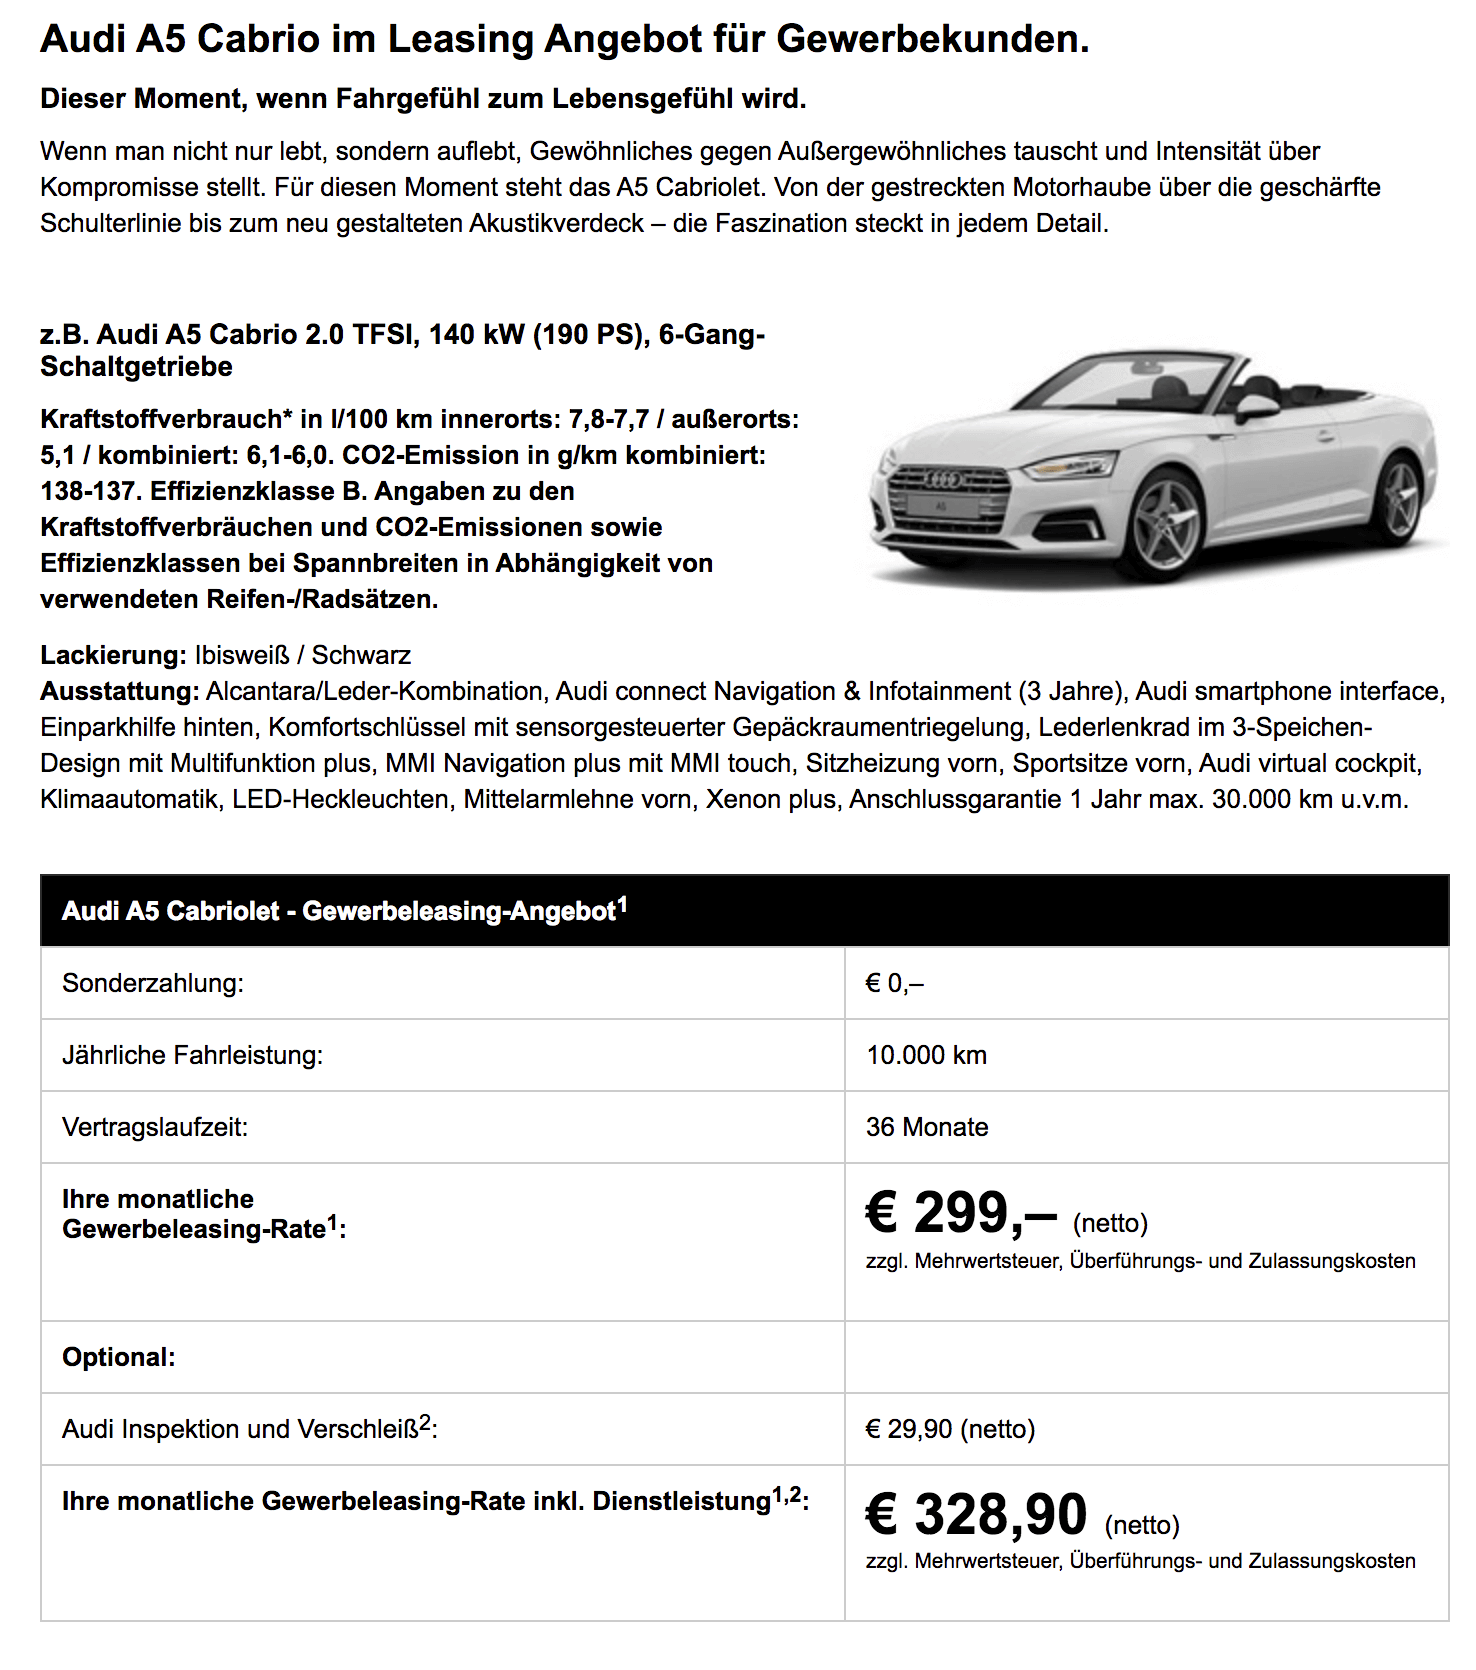 Audi A5 Cabrio Leasing